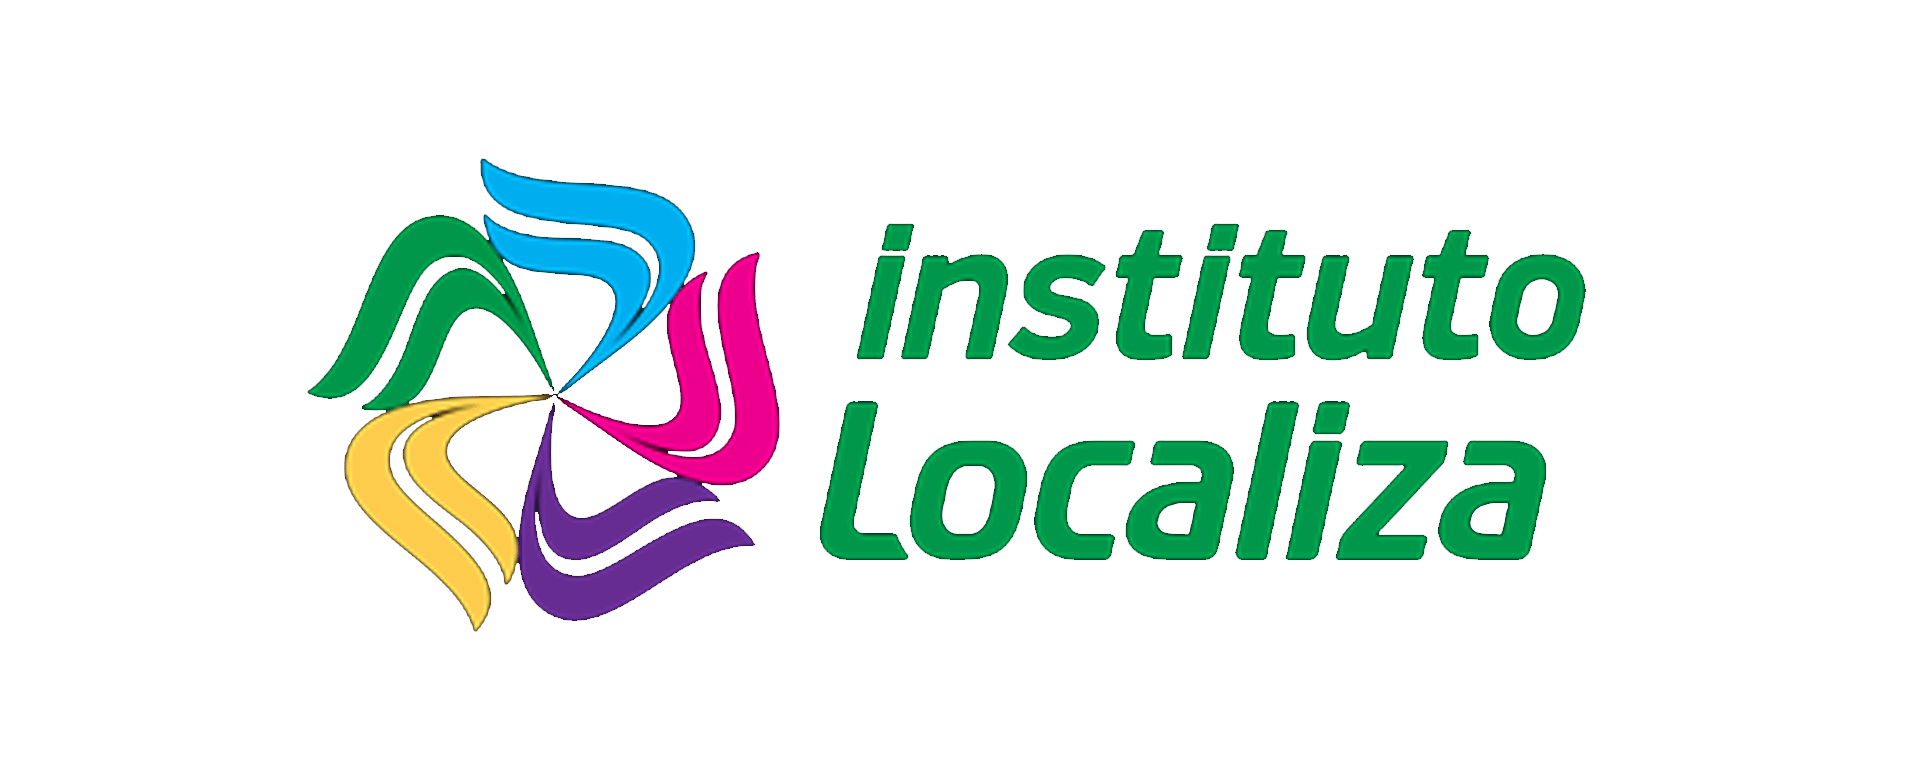 instituto-localiza-gad-identidade-visual-1